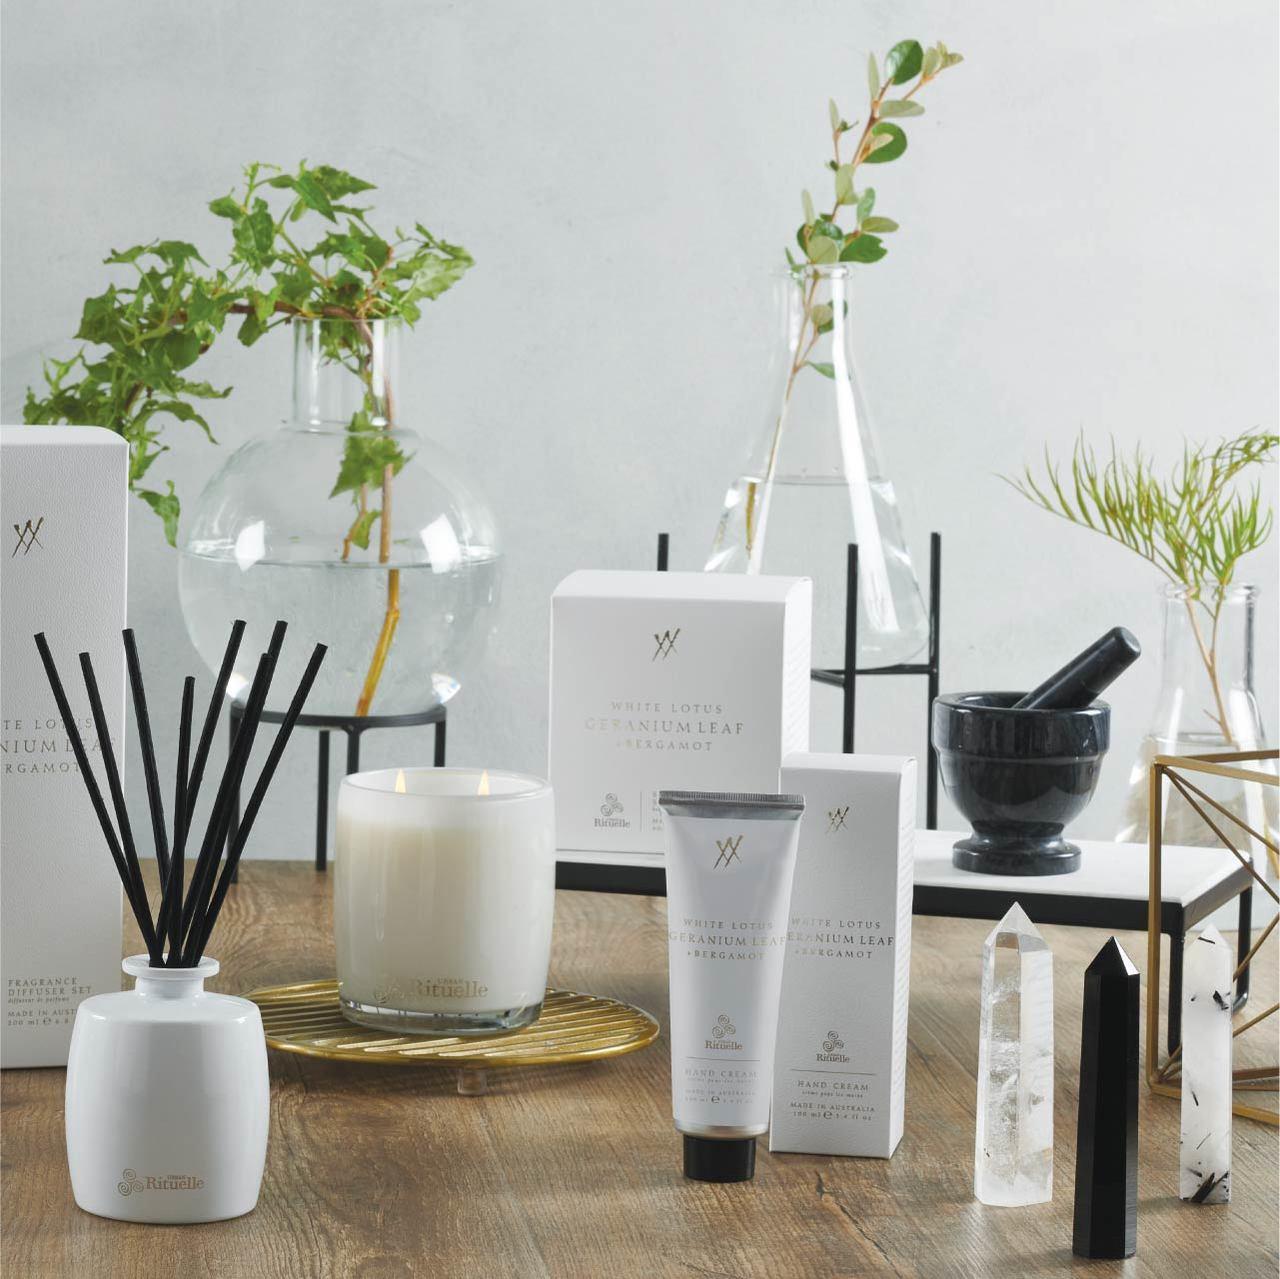 Alchemy - White Lotus, Geranium Leaf & Bergamot - Scented Soy Candle - Urban Rituelle